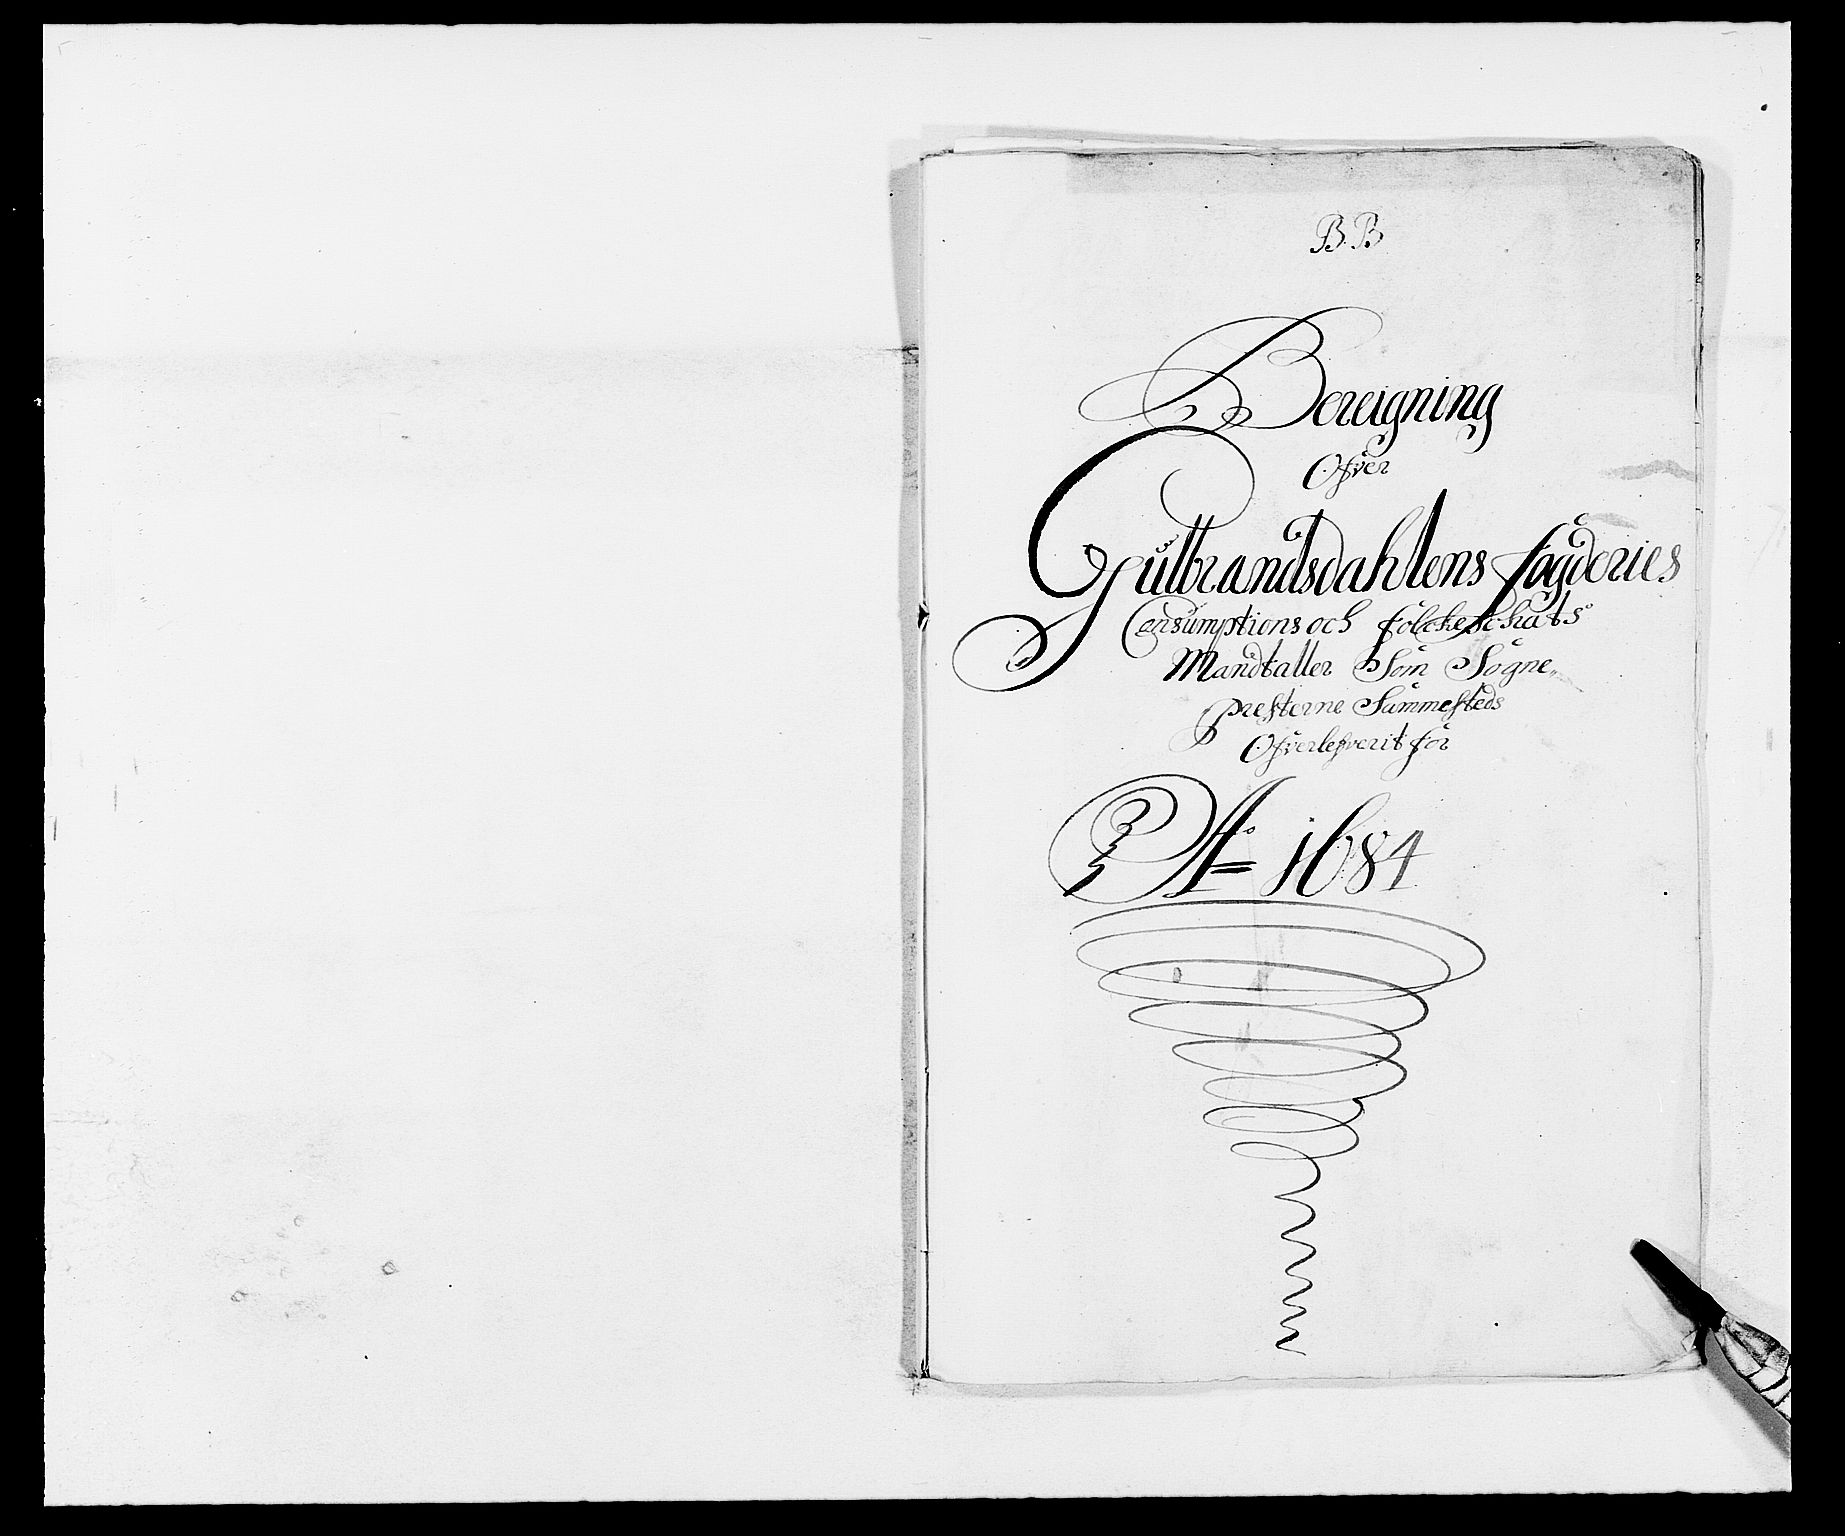 RA, Rentekammeret inntil 1814, Reviderte regnskaper, Fogderegnskap, R17/L1159: Fogderegnskap Gudbrandsdal, 1682-1689, s. 17